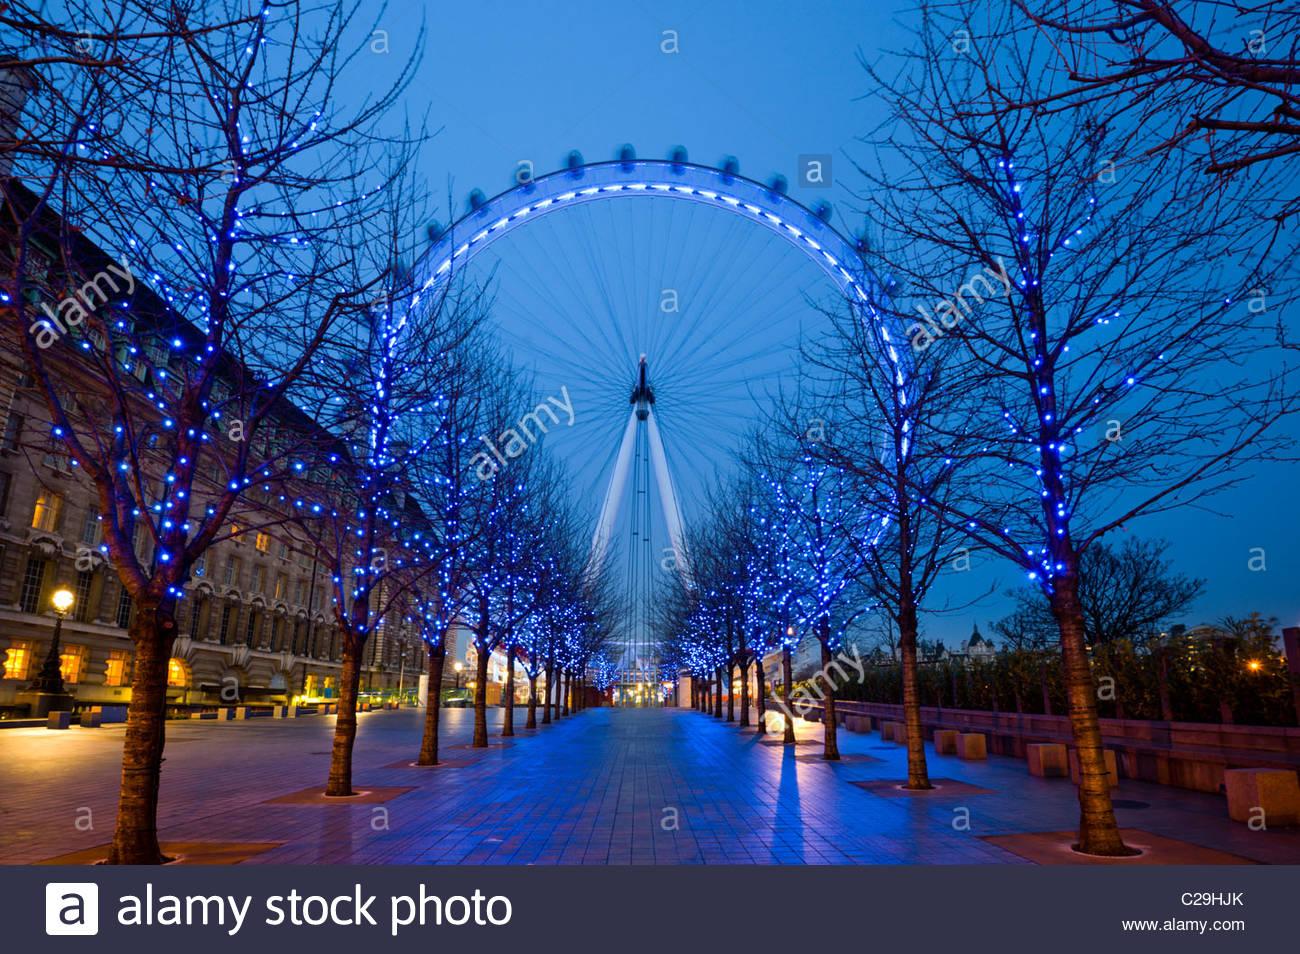 Nacht Blick auf das London Eye im Winter, South Bank, London, UK. Stockbild